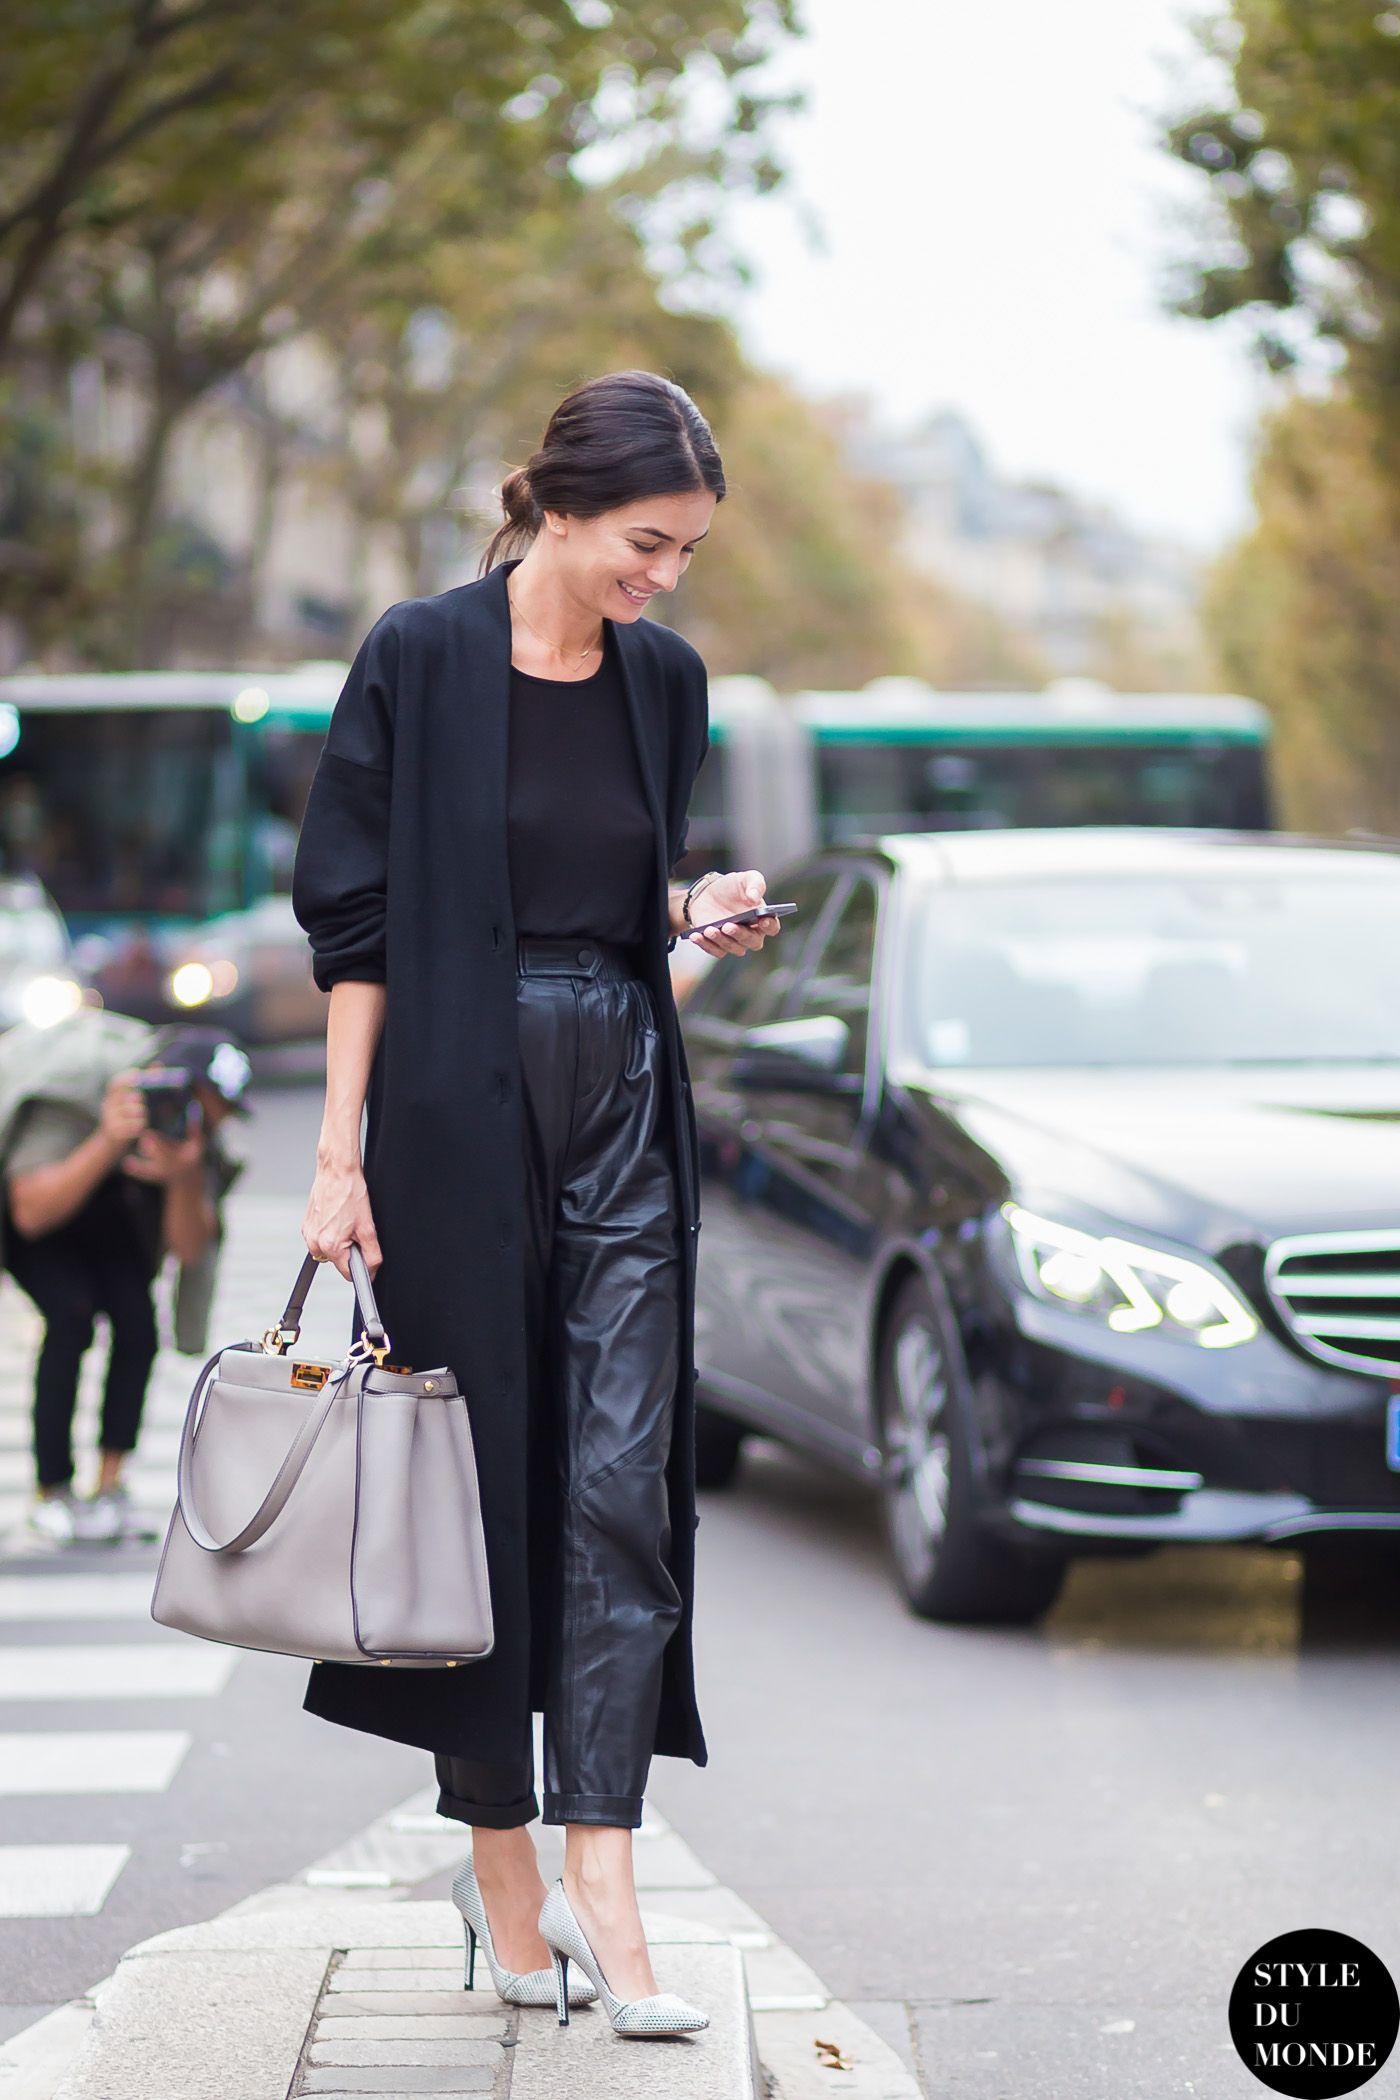 Paris FW SS15 Street Style: Leila Yavari (STYLE DU MONDE ...